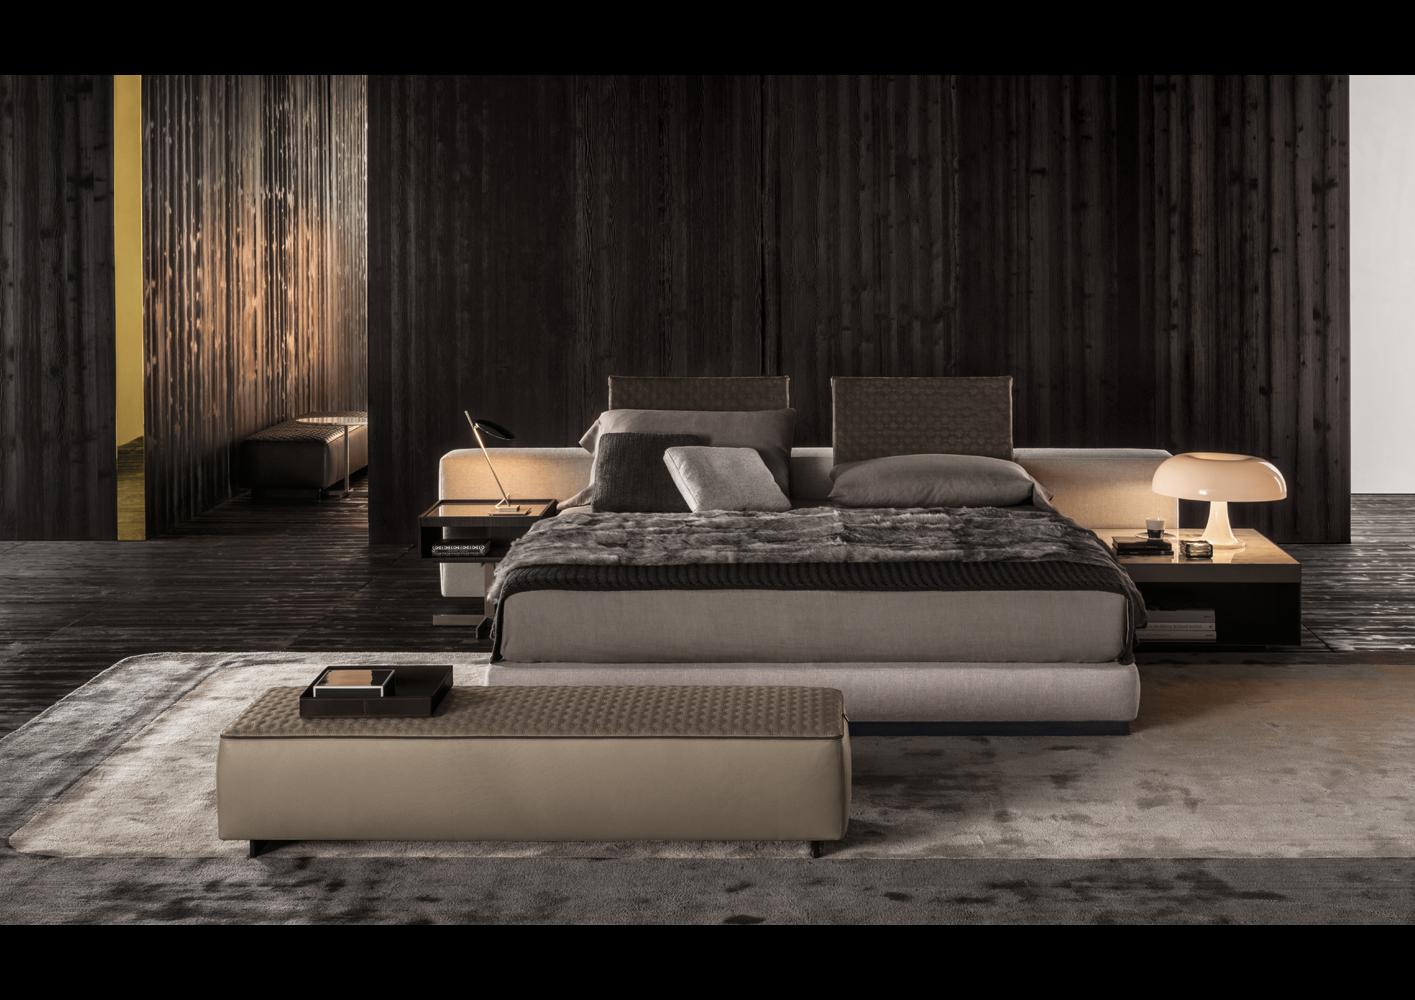 minotti perpetuum mobile handelsagentur henrik maasz. Black Bedroom Furniture Sets. Home Design Ideas